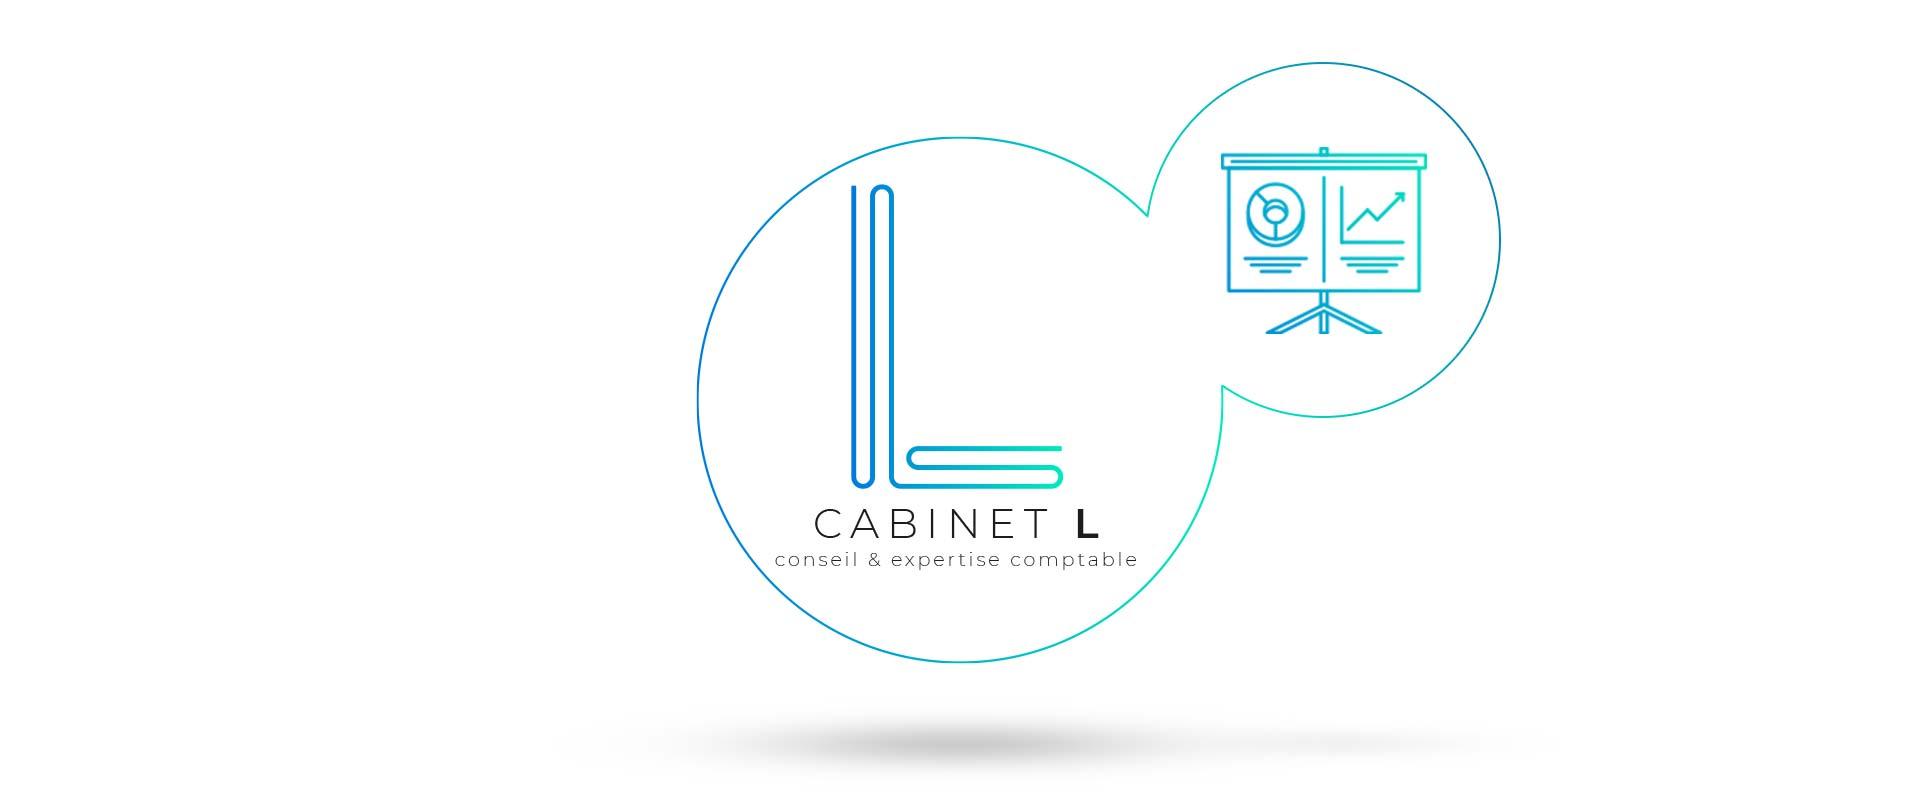 cabinet L expert comptable